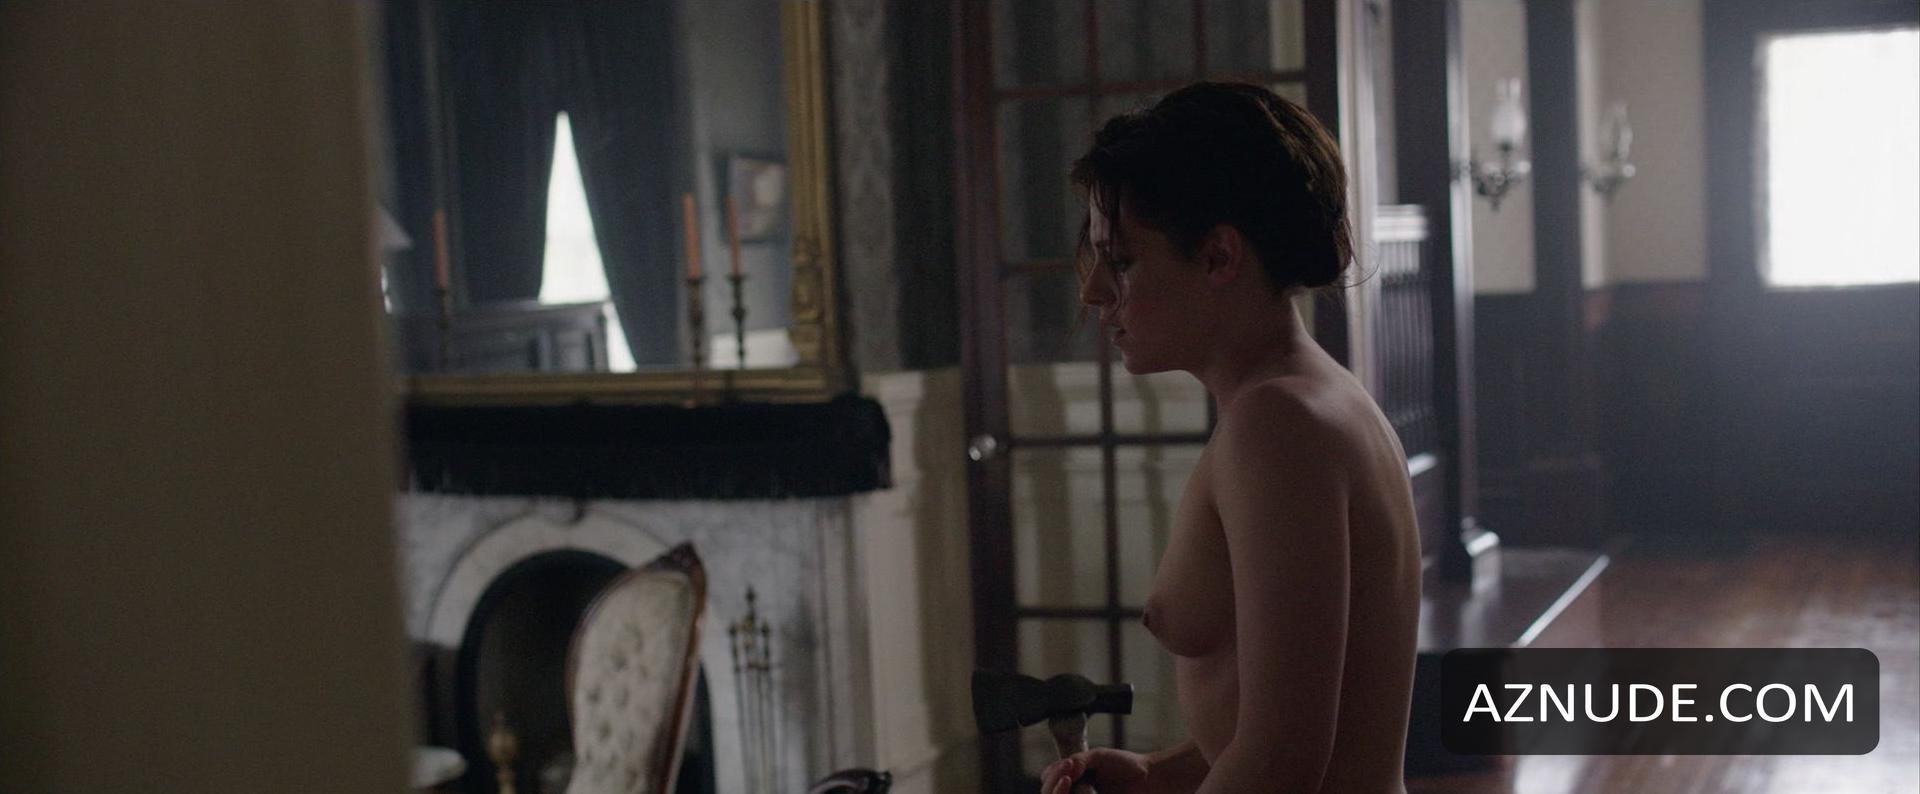 Kristen Stewart Nude - Aznude-5758